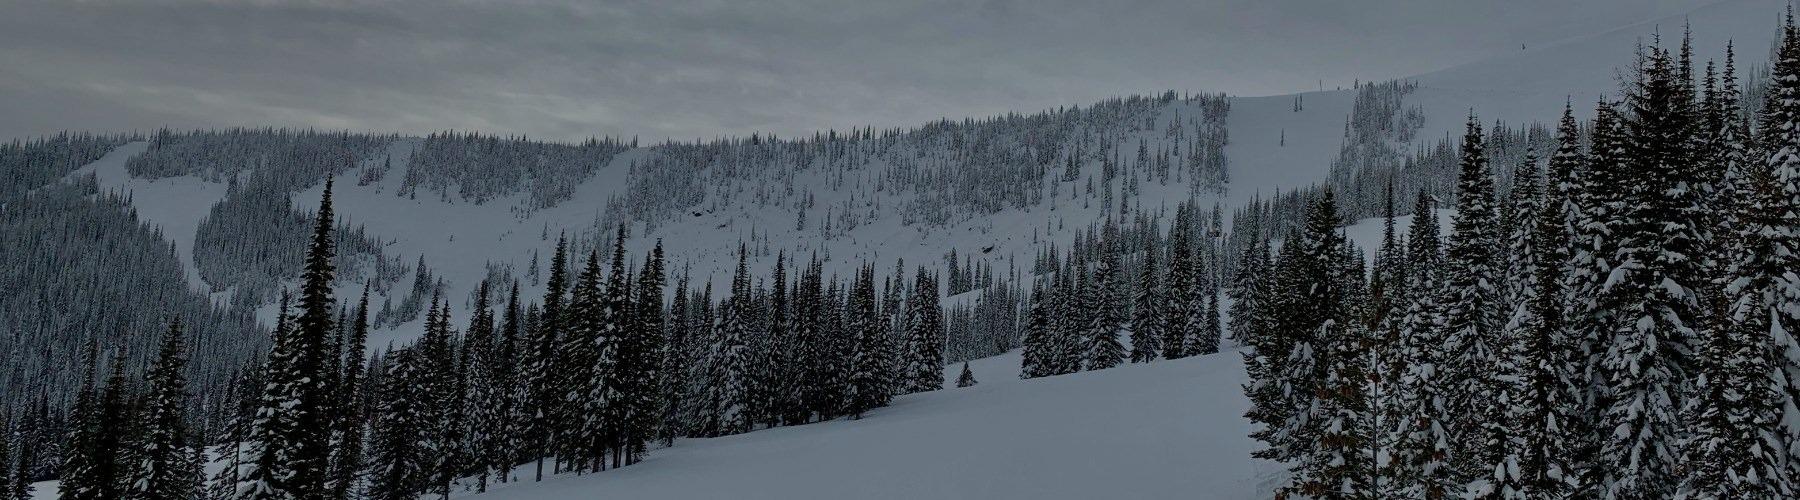 Lookout Pass Idaho